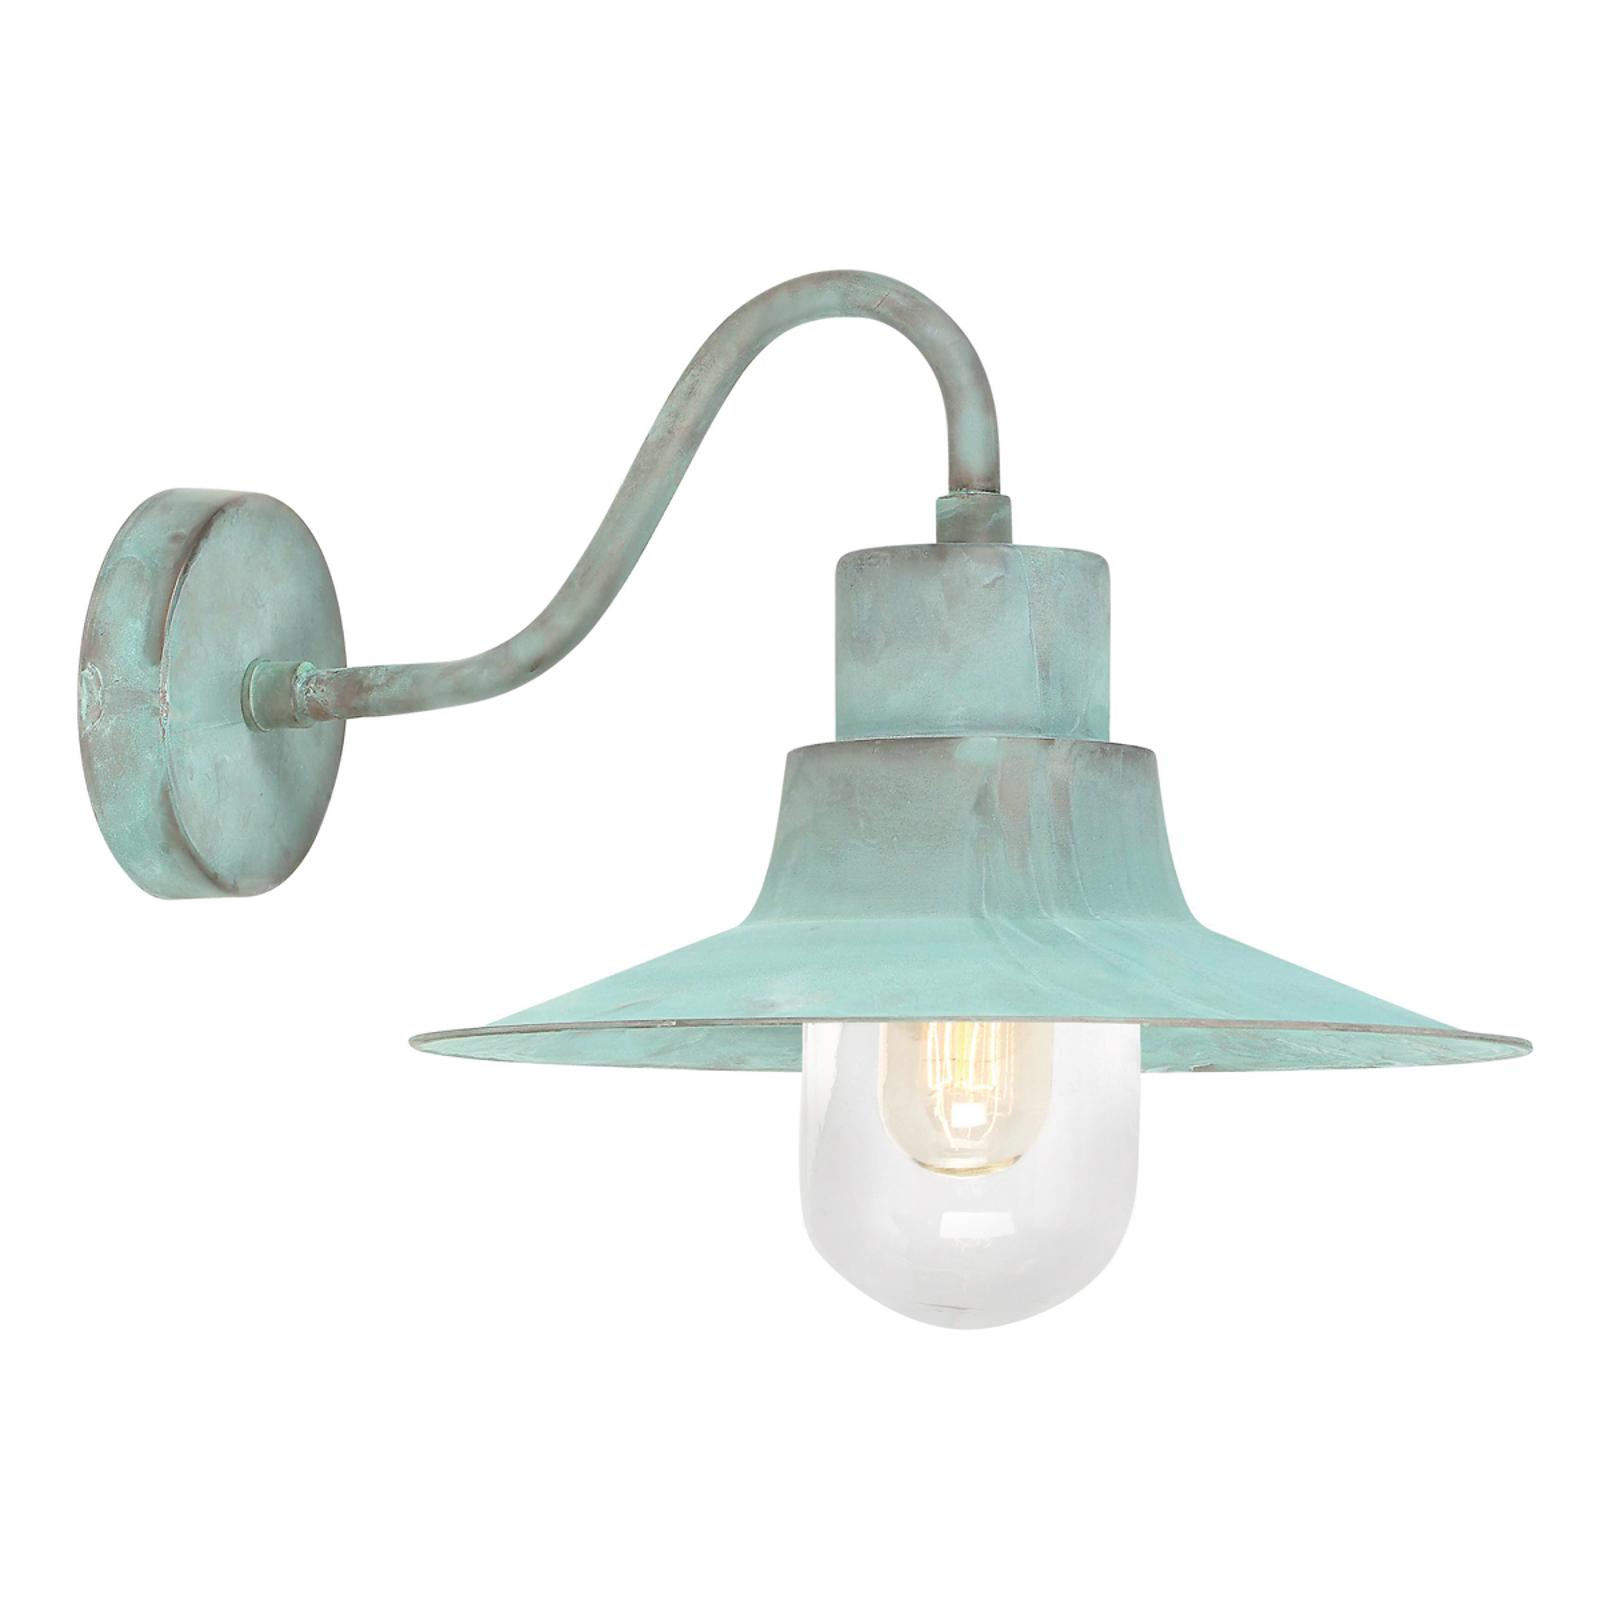 Sheldon - groen gepatineerde buitenwandlamp